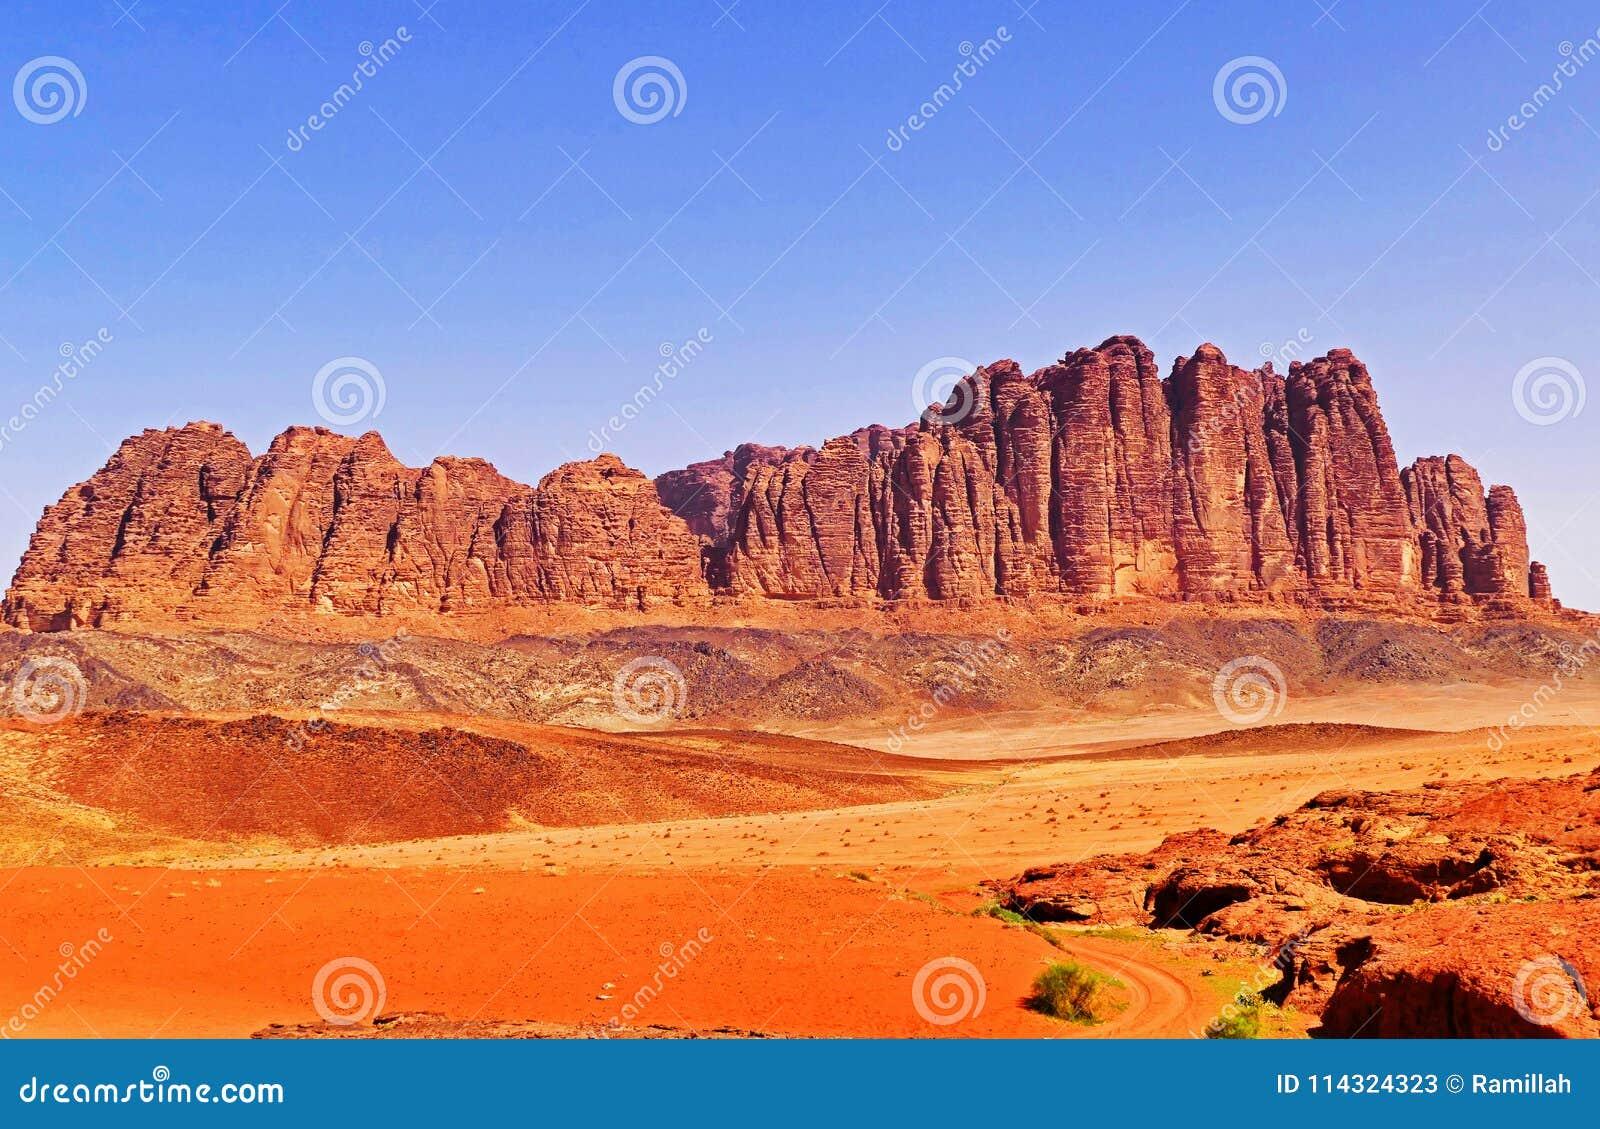 Paysage scénique Rocky Mountain en Wadi Rum Desert, Jordanie